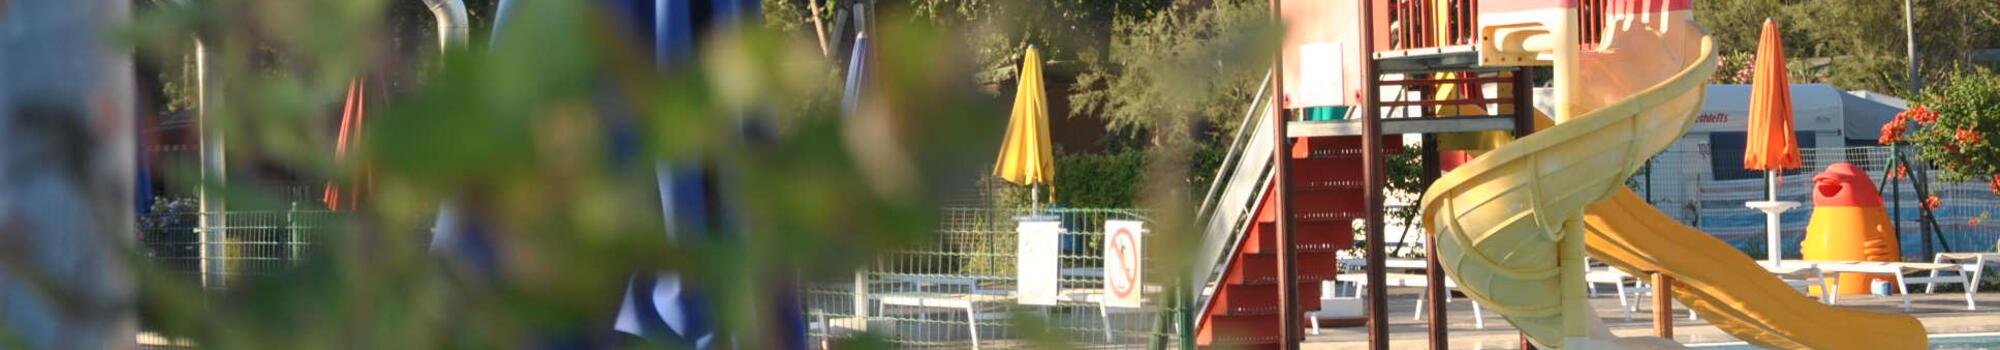 Juli in Bibione Pineda verblijf in stacaravan in camping village aan zee